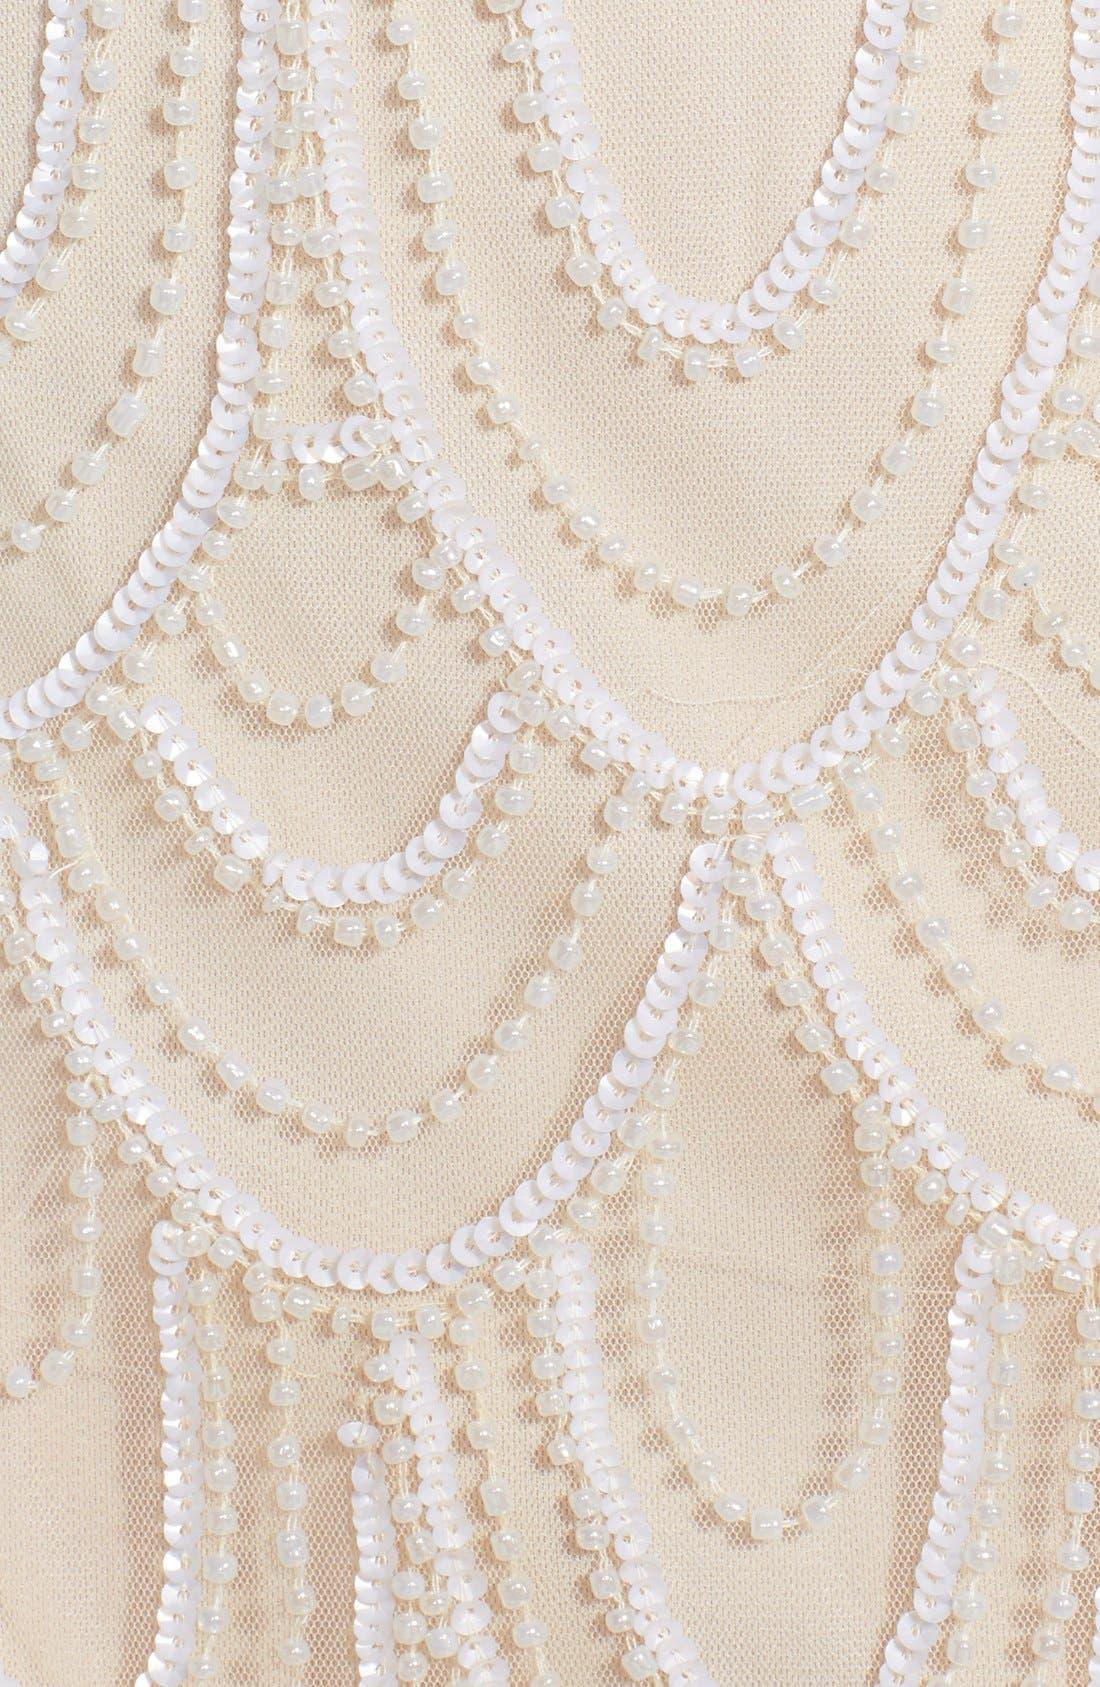 Embellished Mesh Sheath Dress,                             Alternate thumbnail 51, color,